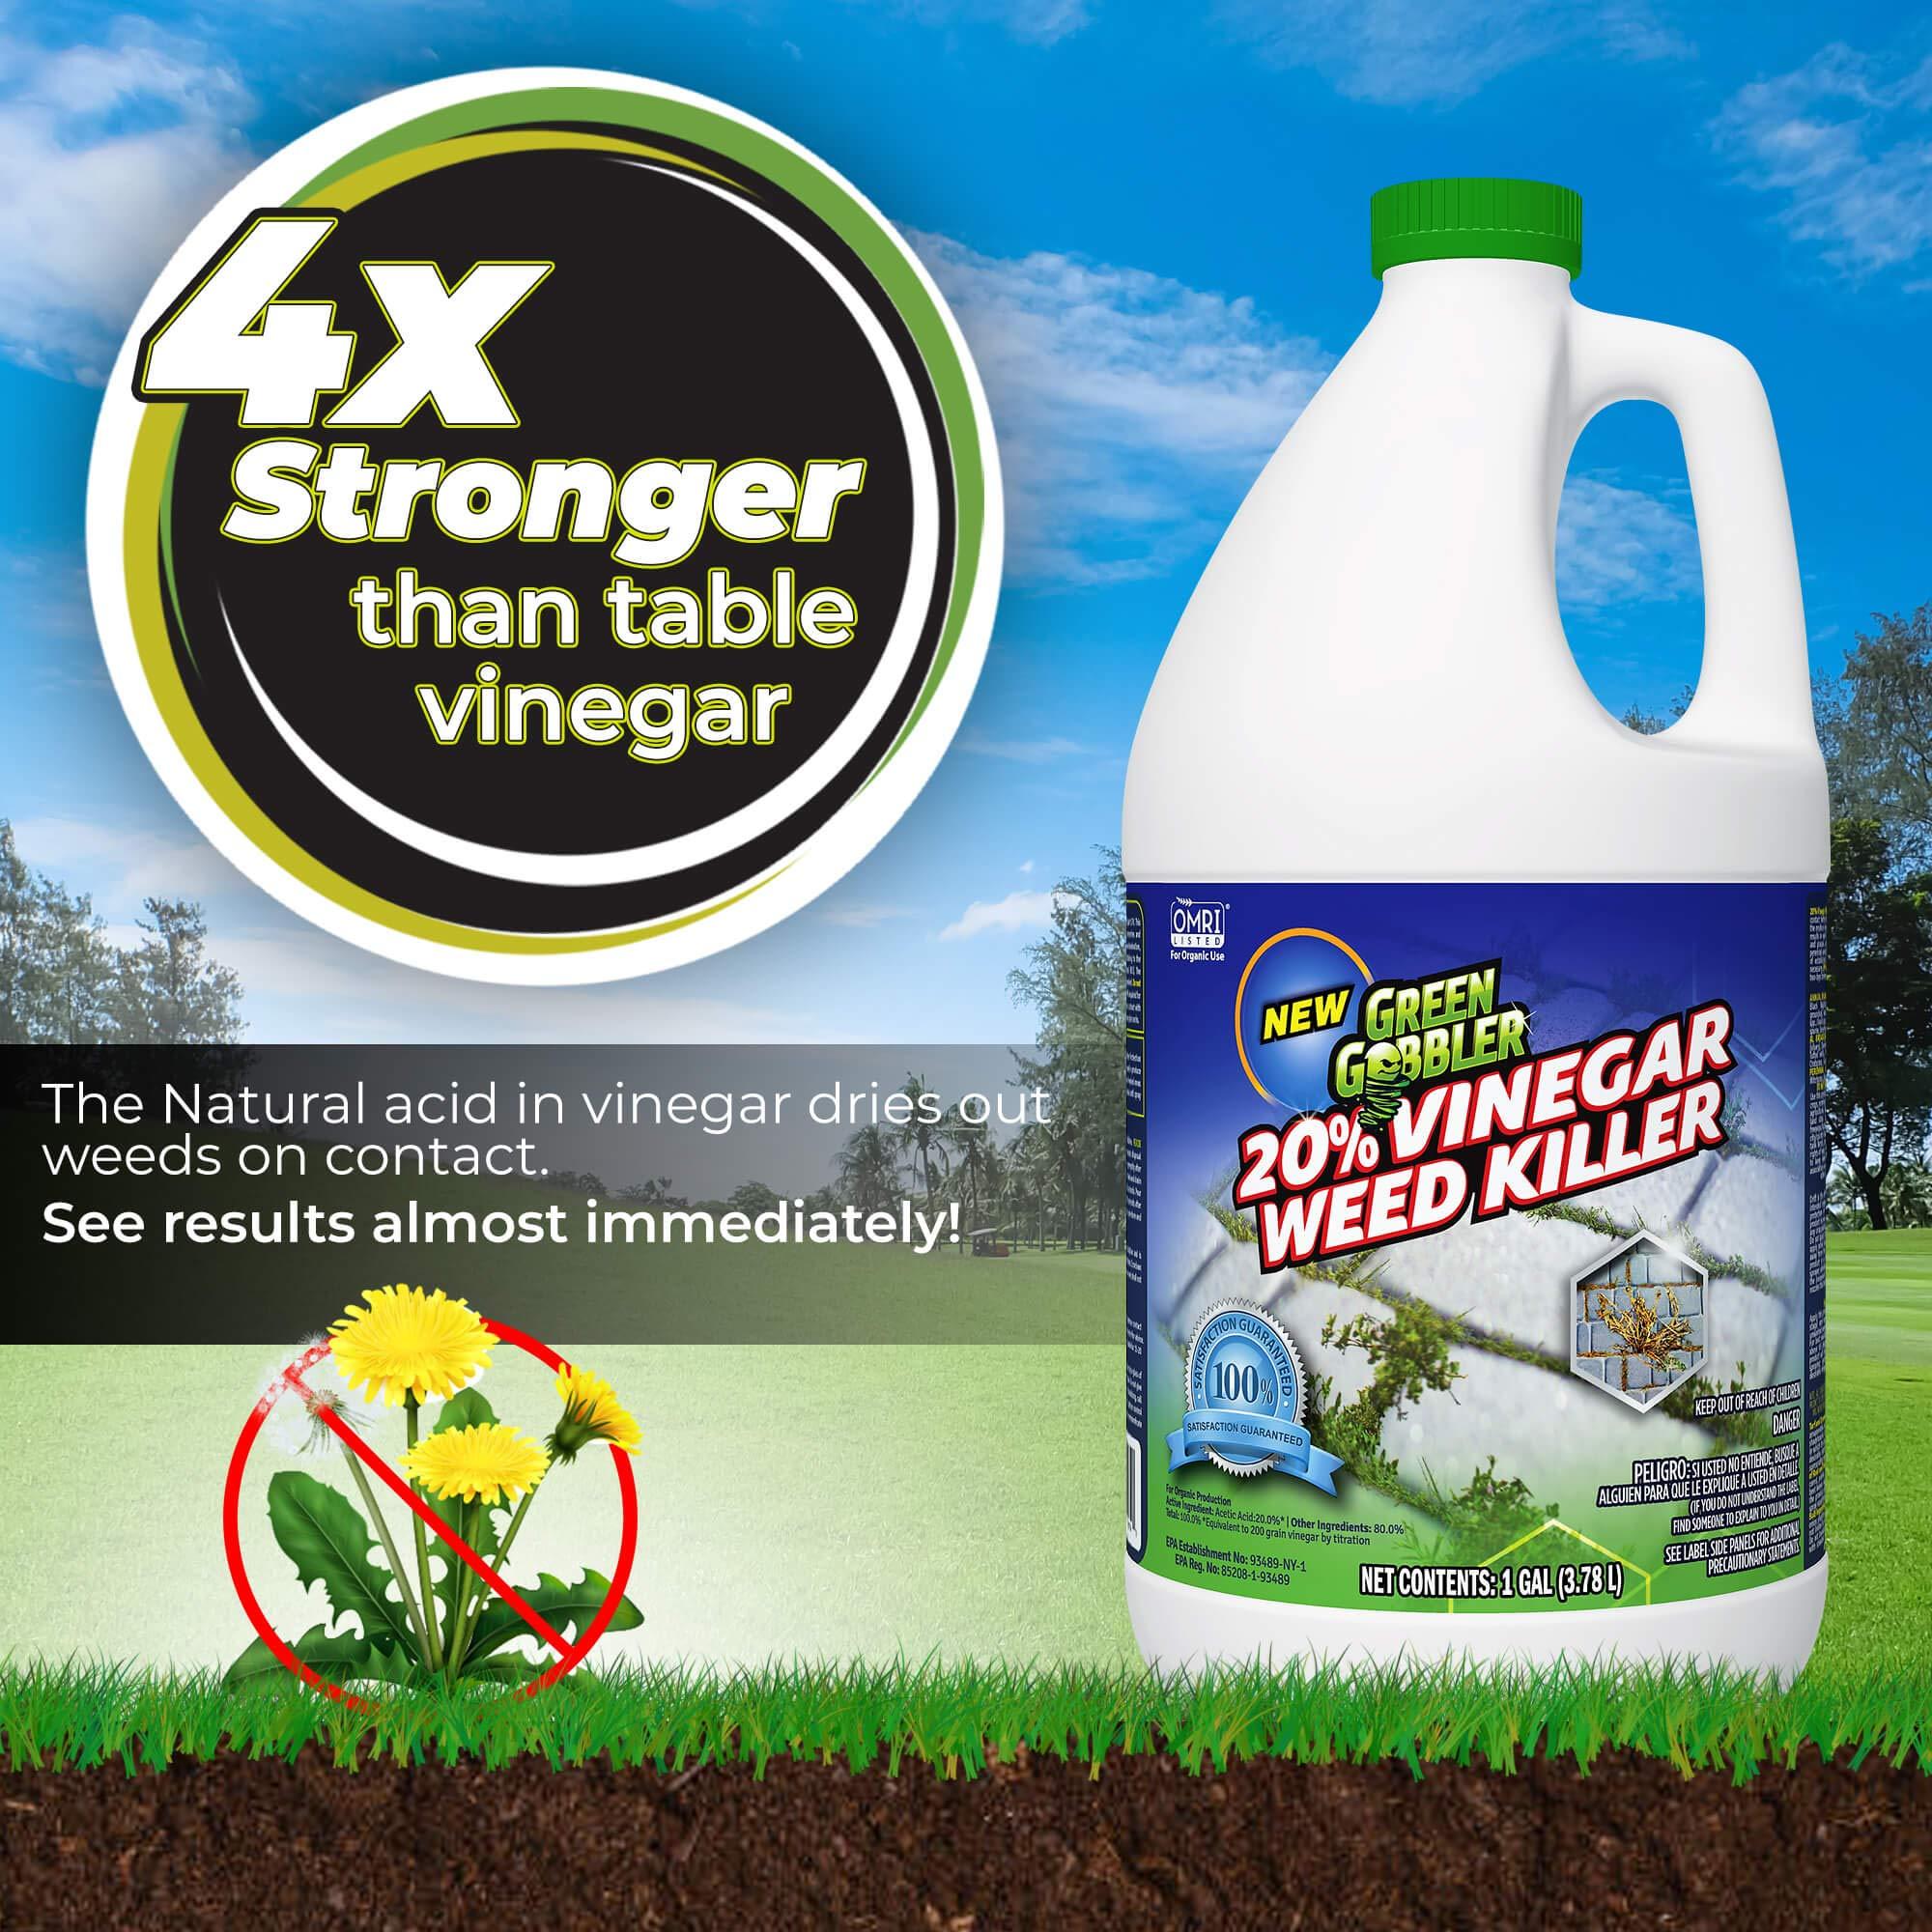 Green Gobbler 20% Horticultural Vinegar Weed Killer   Herbicide   Natural Weed Killer   Organic Weed Killer (5 Gallon Pail) by Green Gobbler (Image #5)